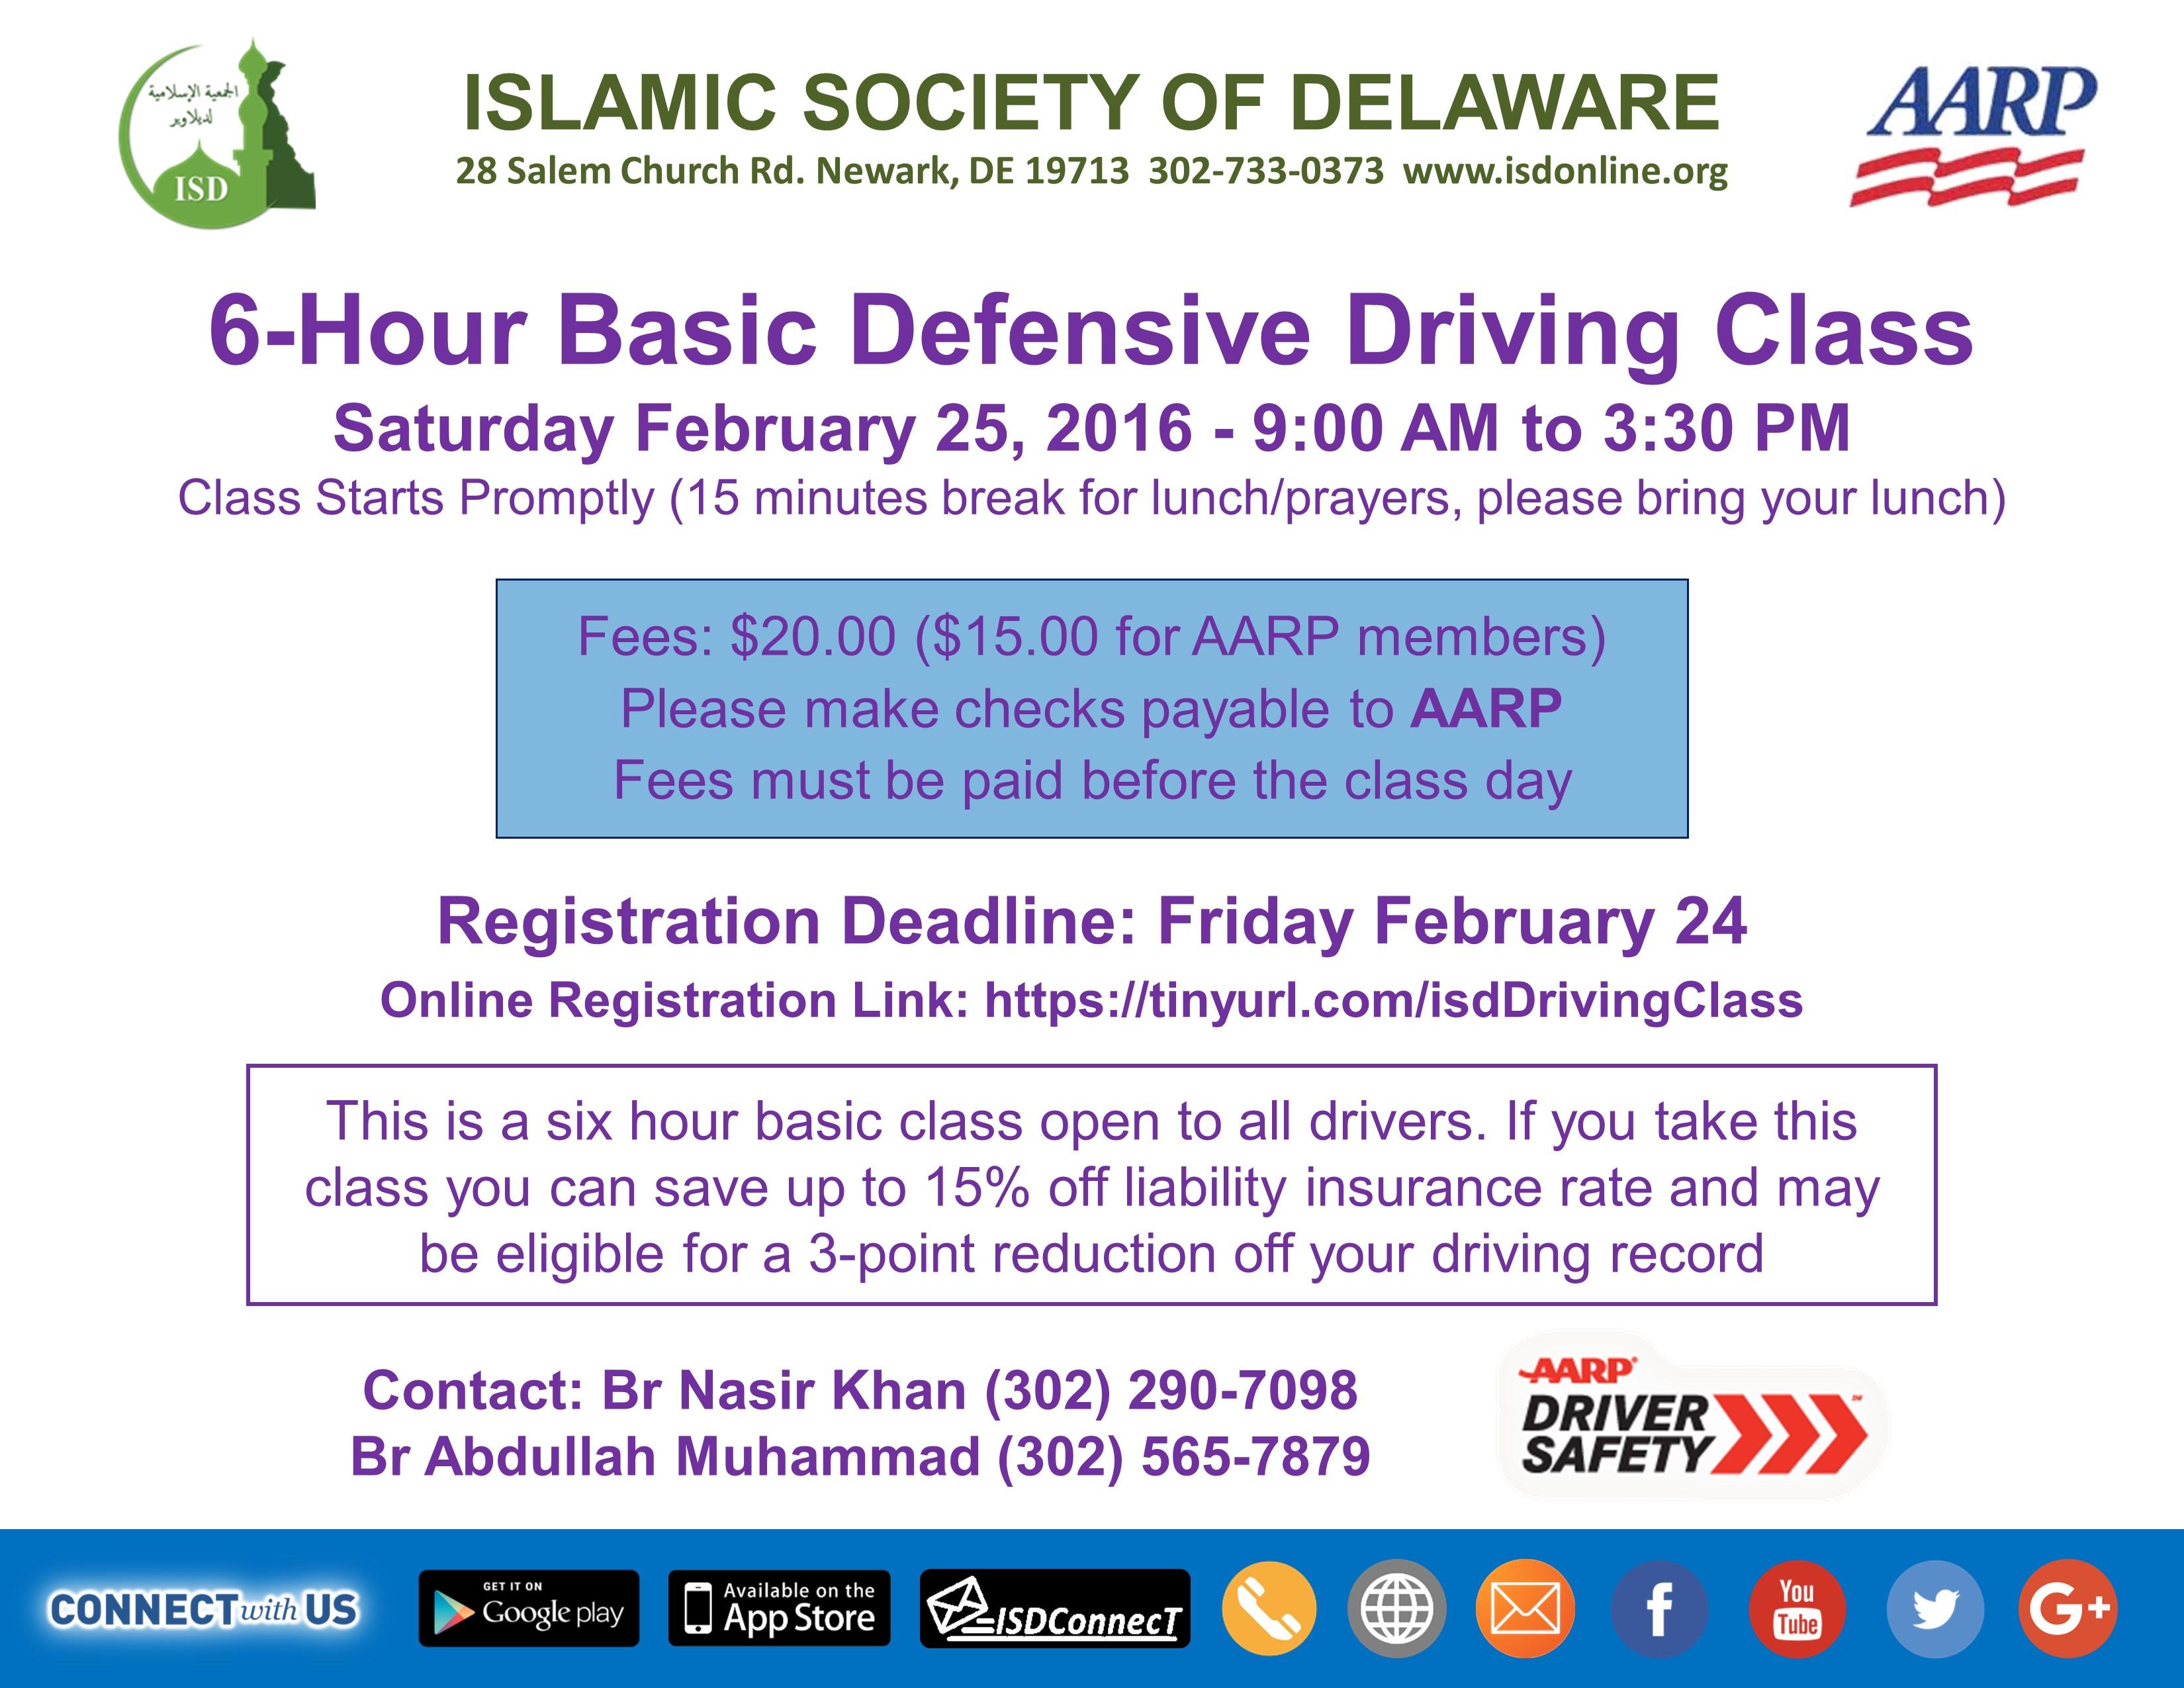 DefensiveDrivingClassFeb25